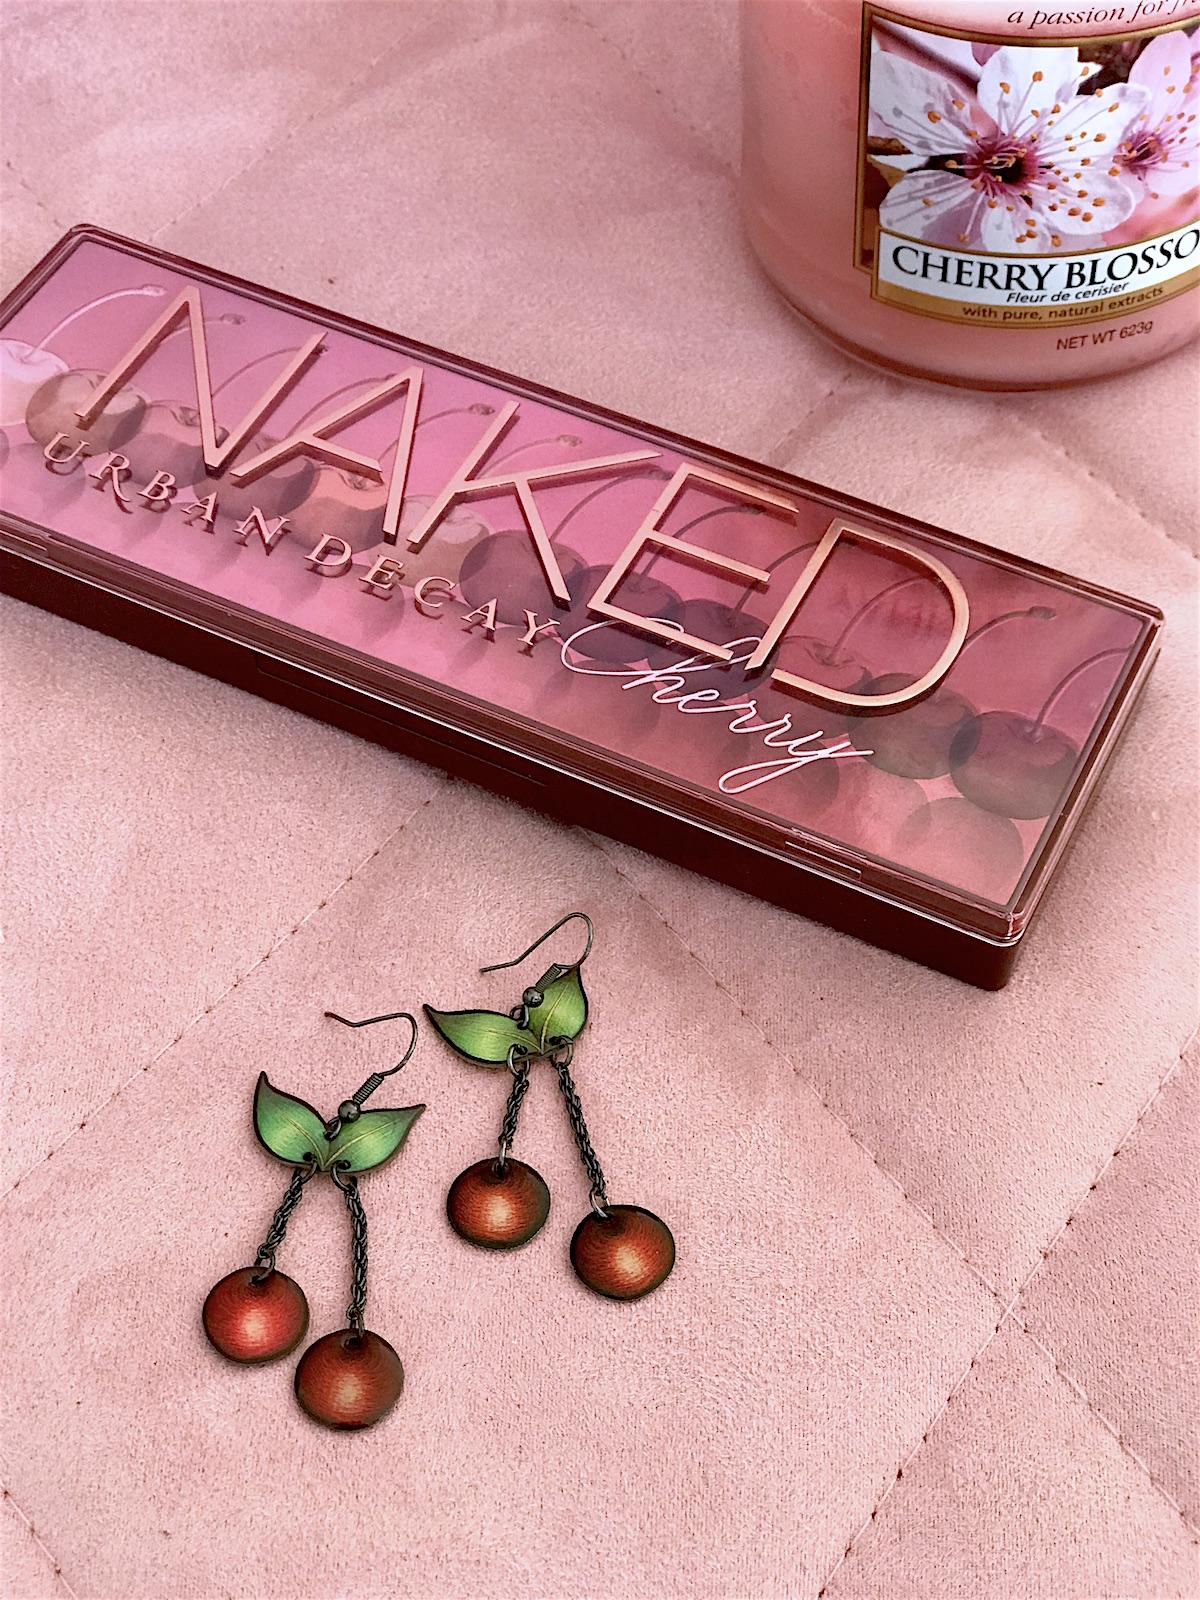 Kozmetika moda cesnje jagode cvetovi Beautyfullblog urban decay naked paleta